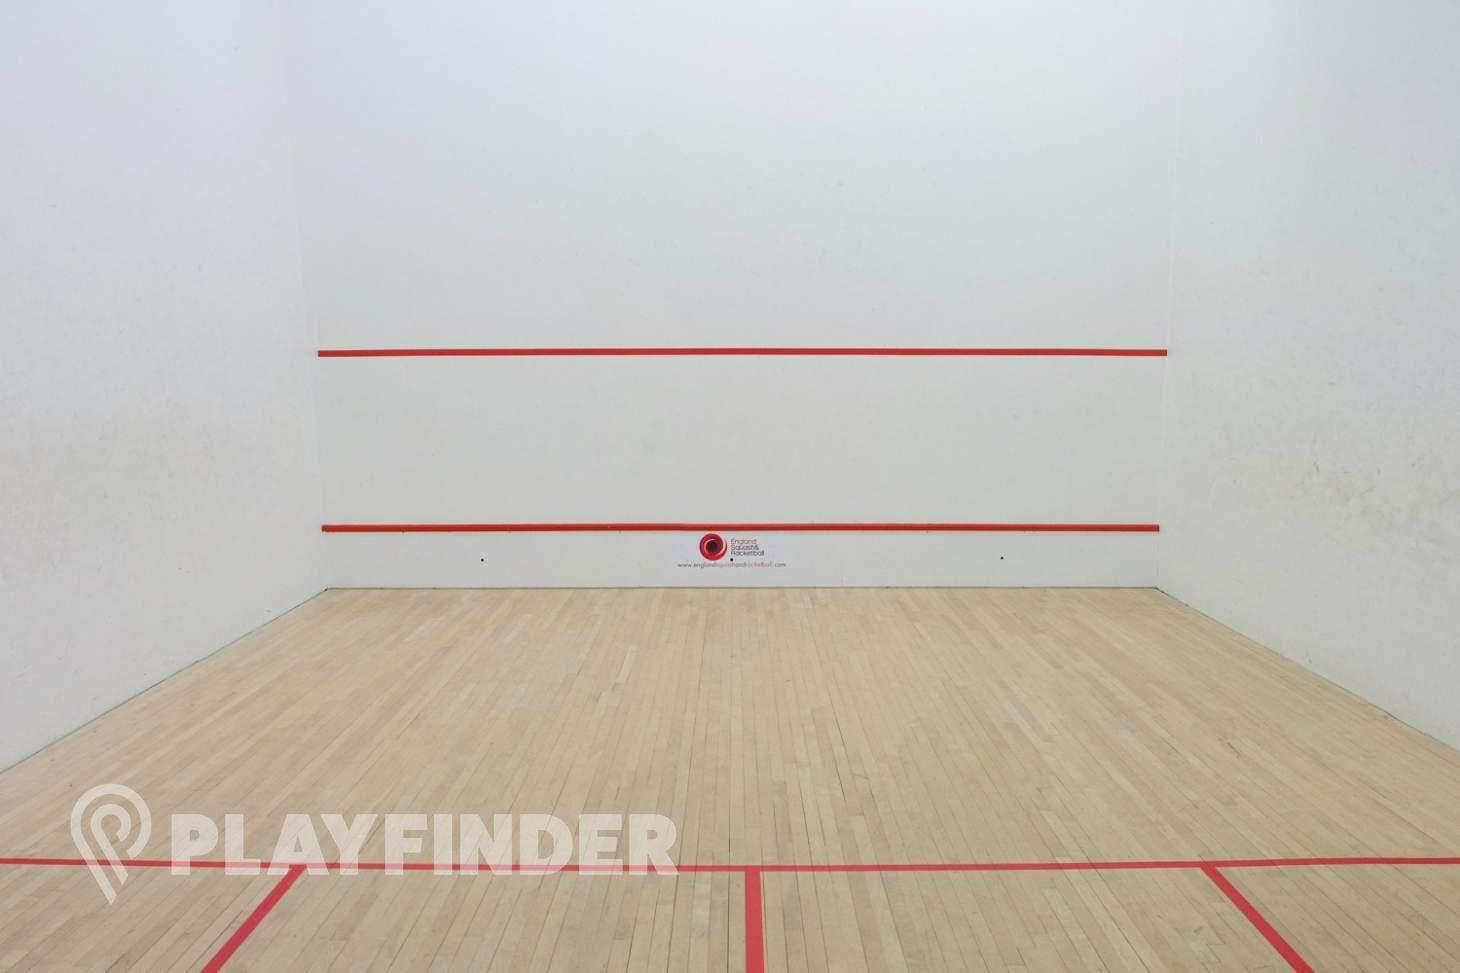 Batchwood Sports Centre Indoor | Hard squash court